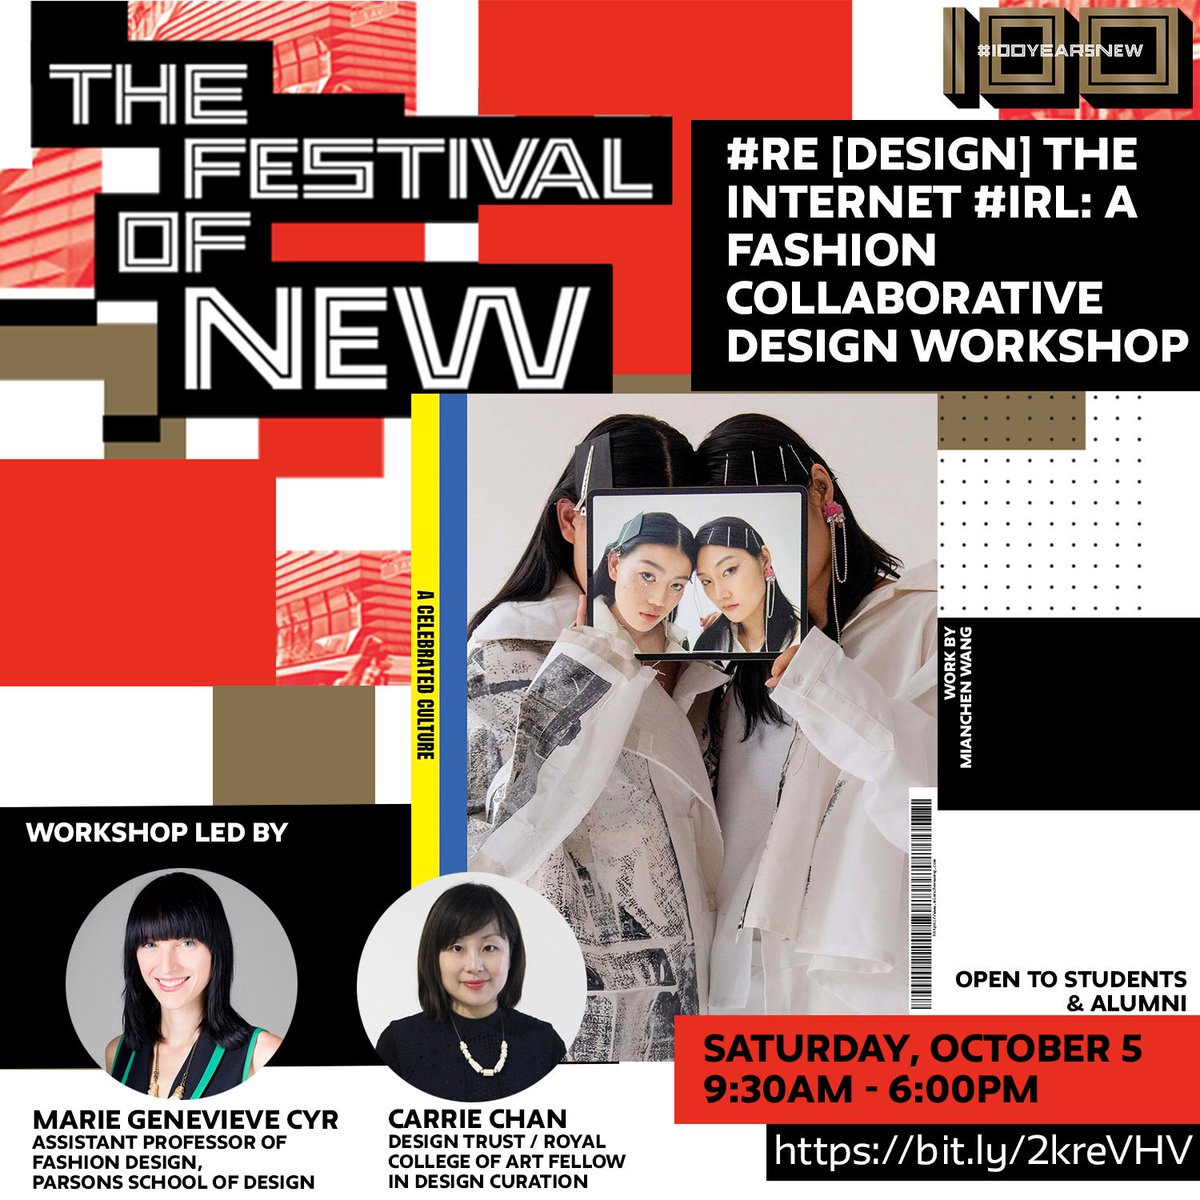 #RE [Design] the internet #IRL: A Fashion Collaborative Design Workshop. Register now: https://t.co/XEZXzfClzb @TheNewSchool @parsonsdesign https://t.co/T53c0UEqTv